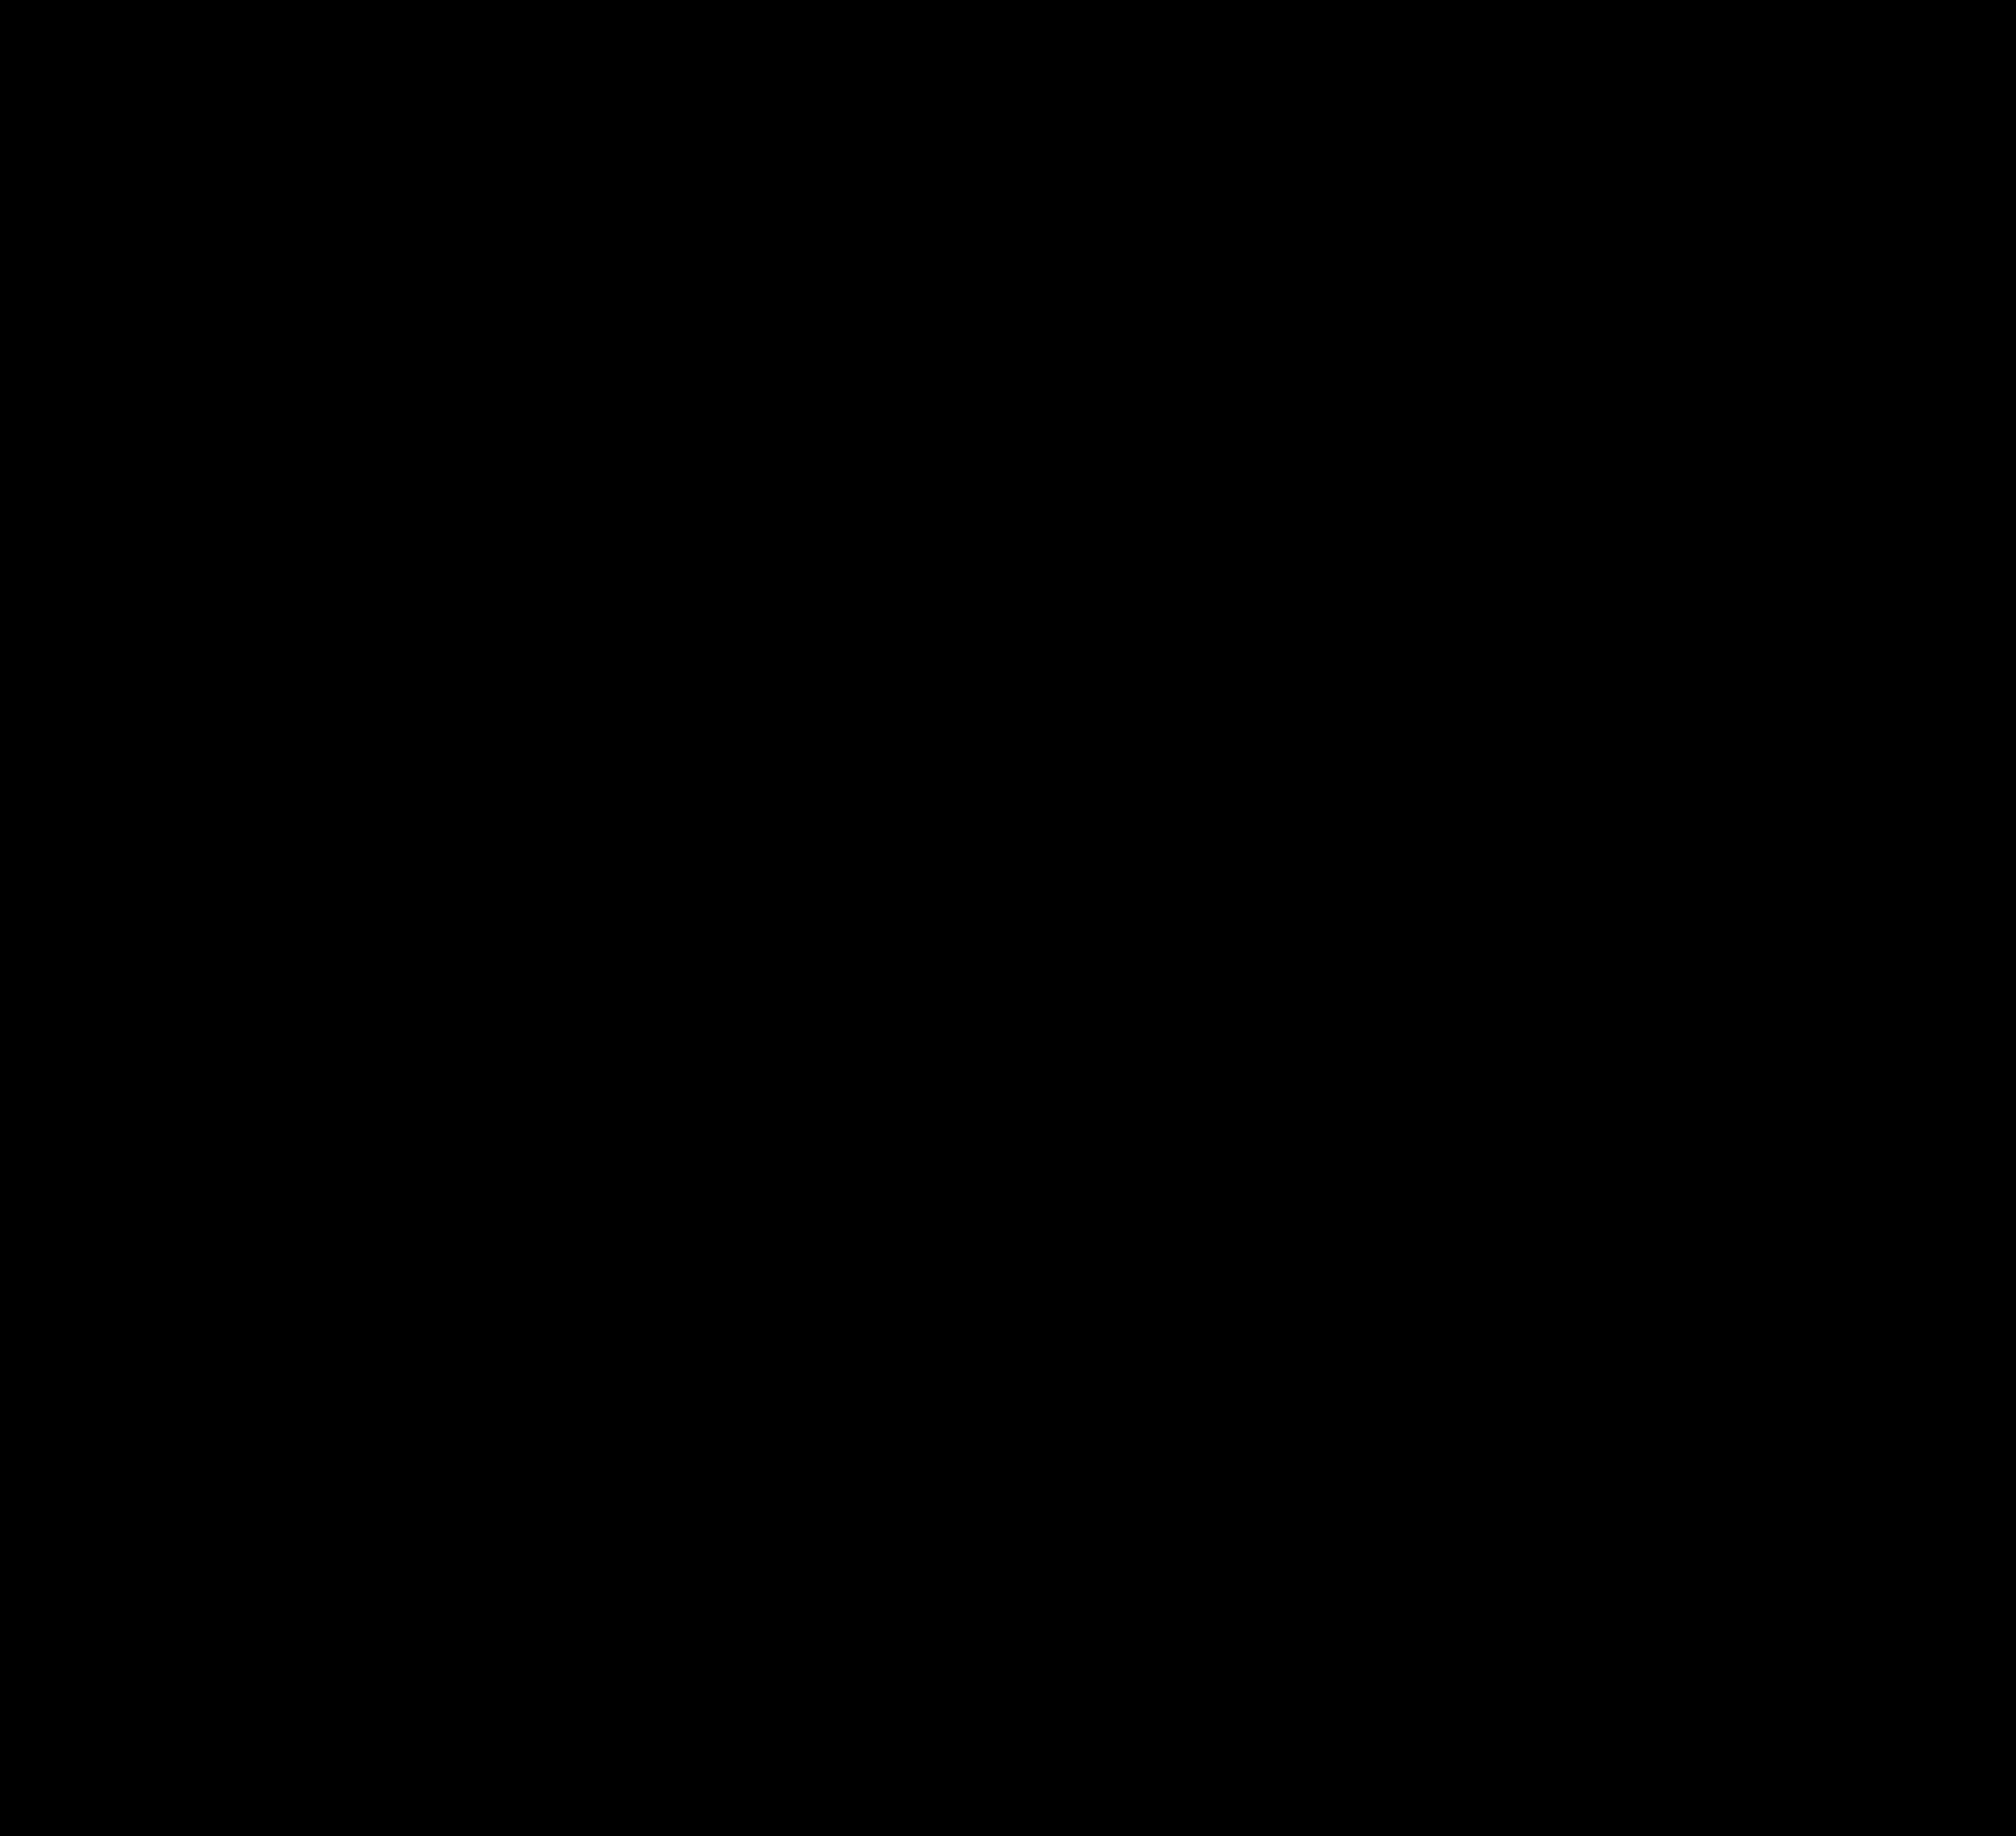 Horn clipart black and white. Post emblem big image